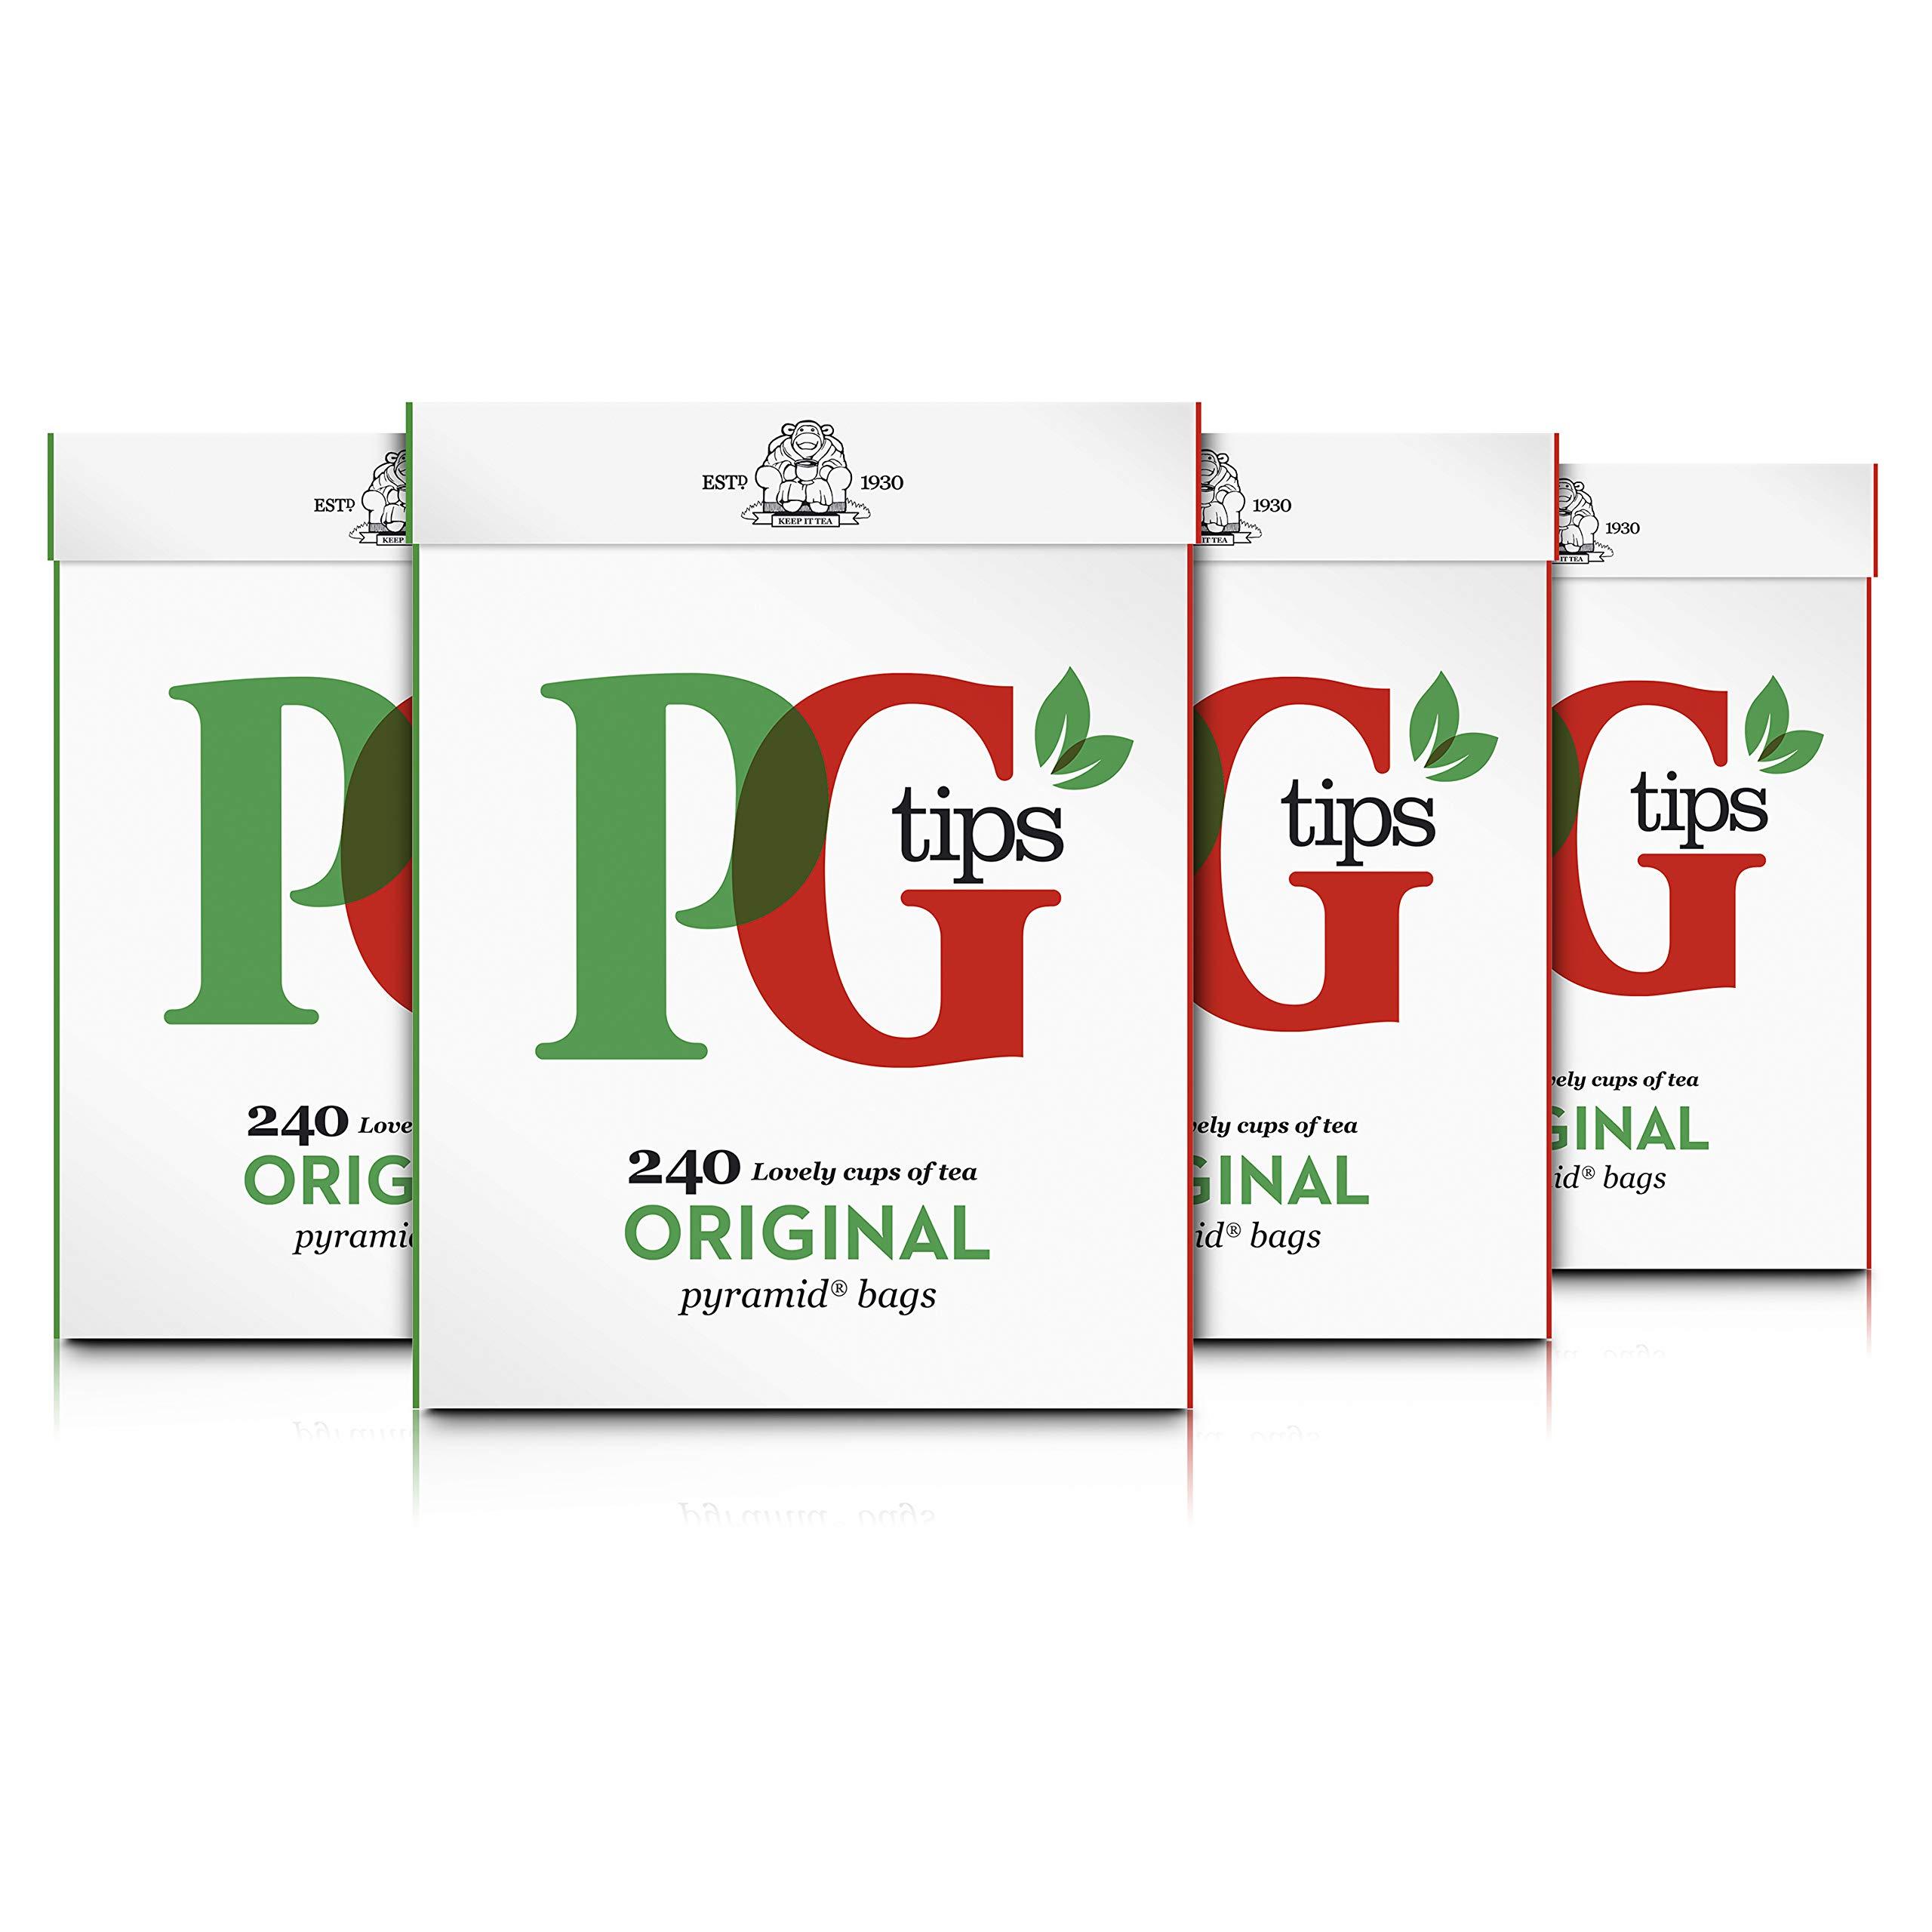 PG Tips tea bundle (rainforest alliance) (black tea) (4 packs of 240 bags) (960 bags) (brews in 2-3 minutes)